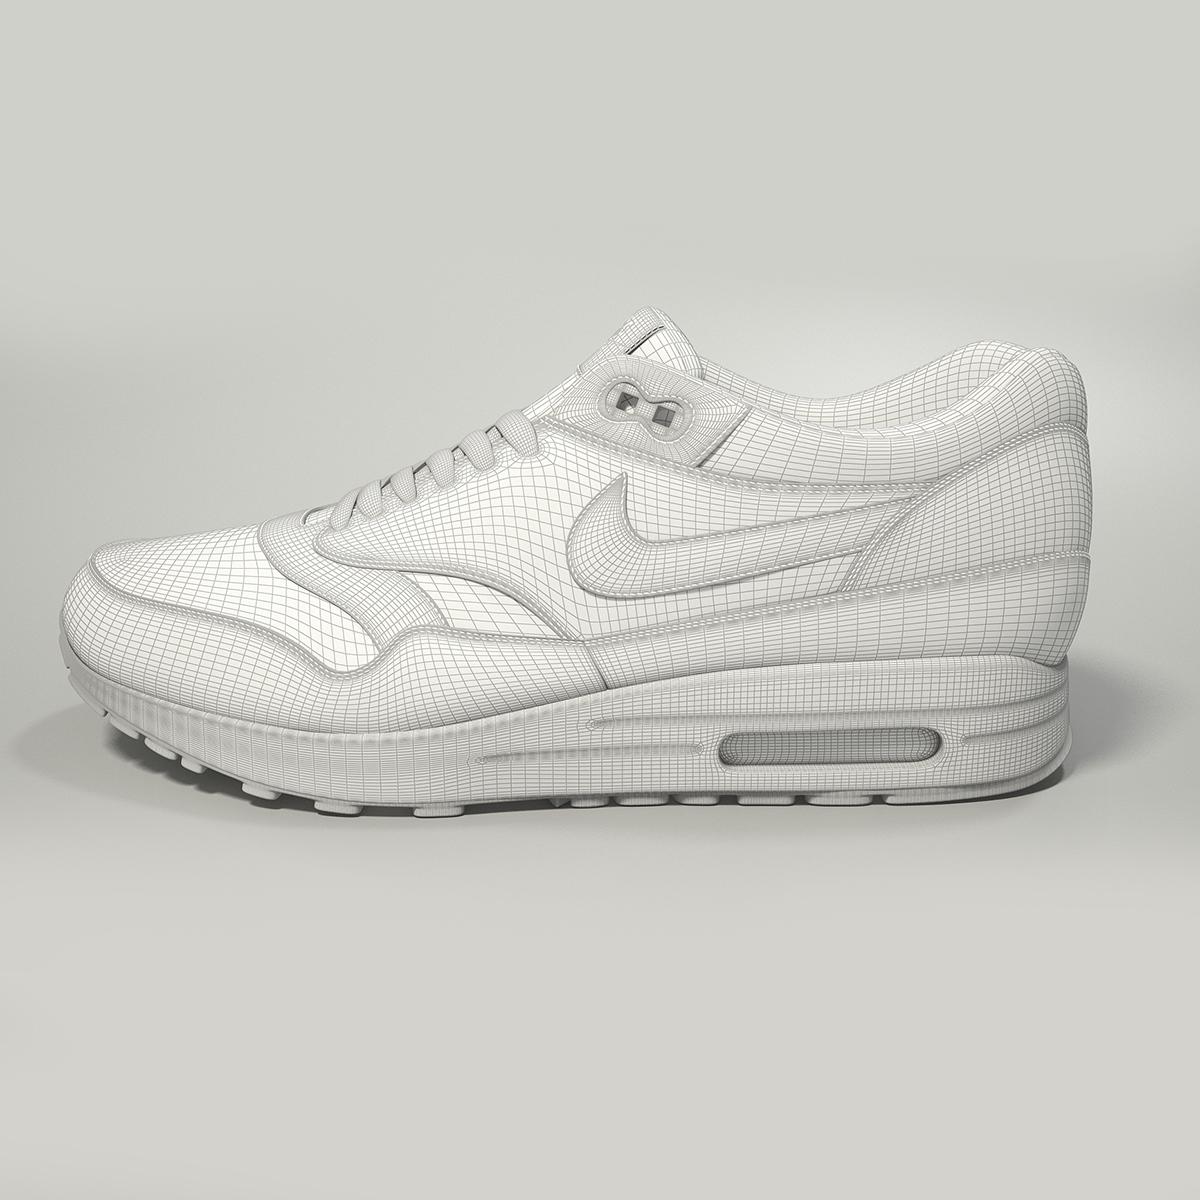 cheap for discount cbeeb 204f7 Nike Air Max 1 3D model